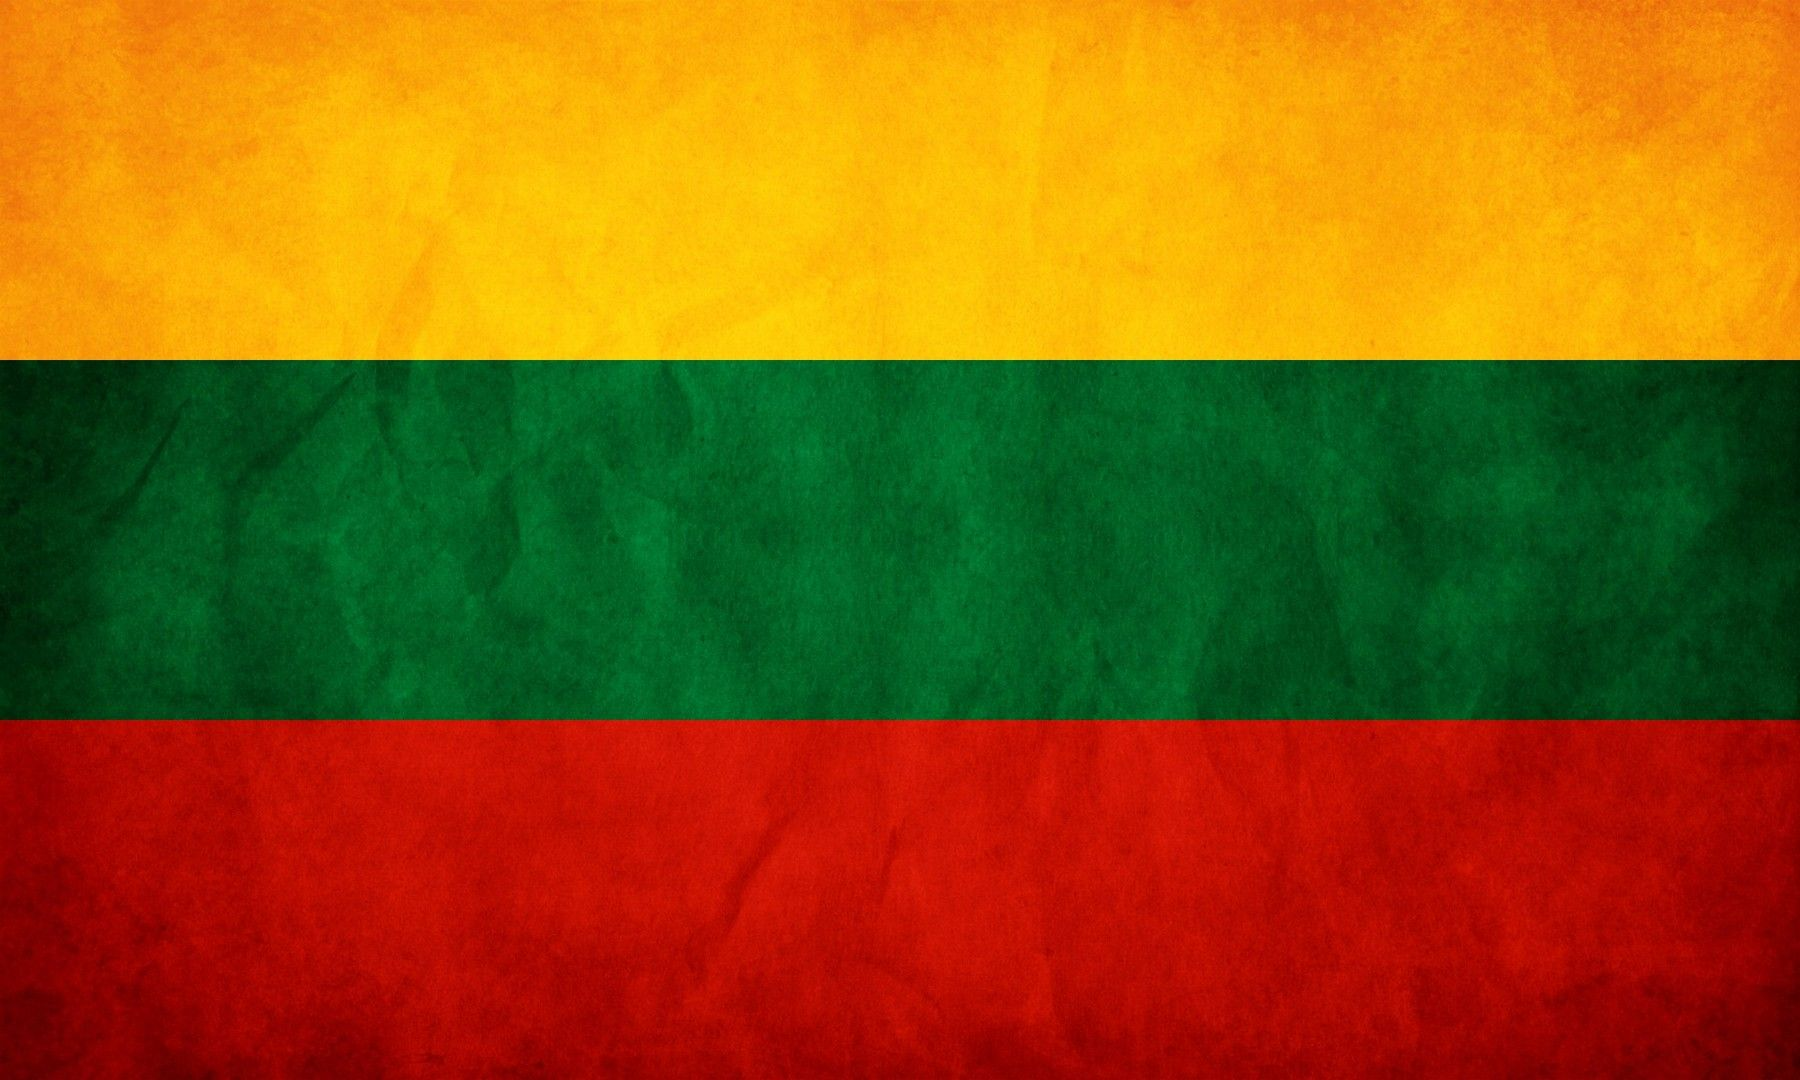 Lithuania grunge flag photo